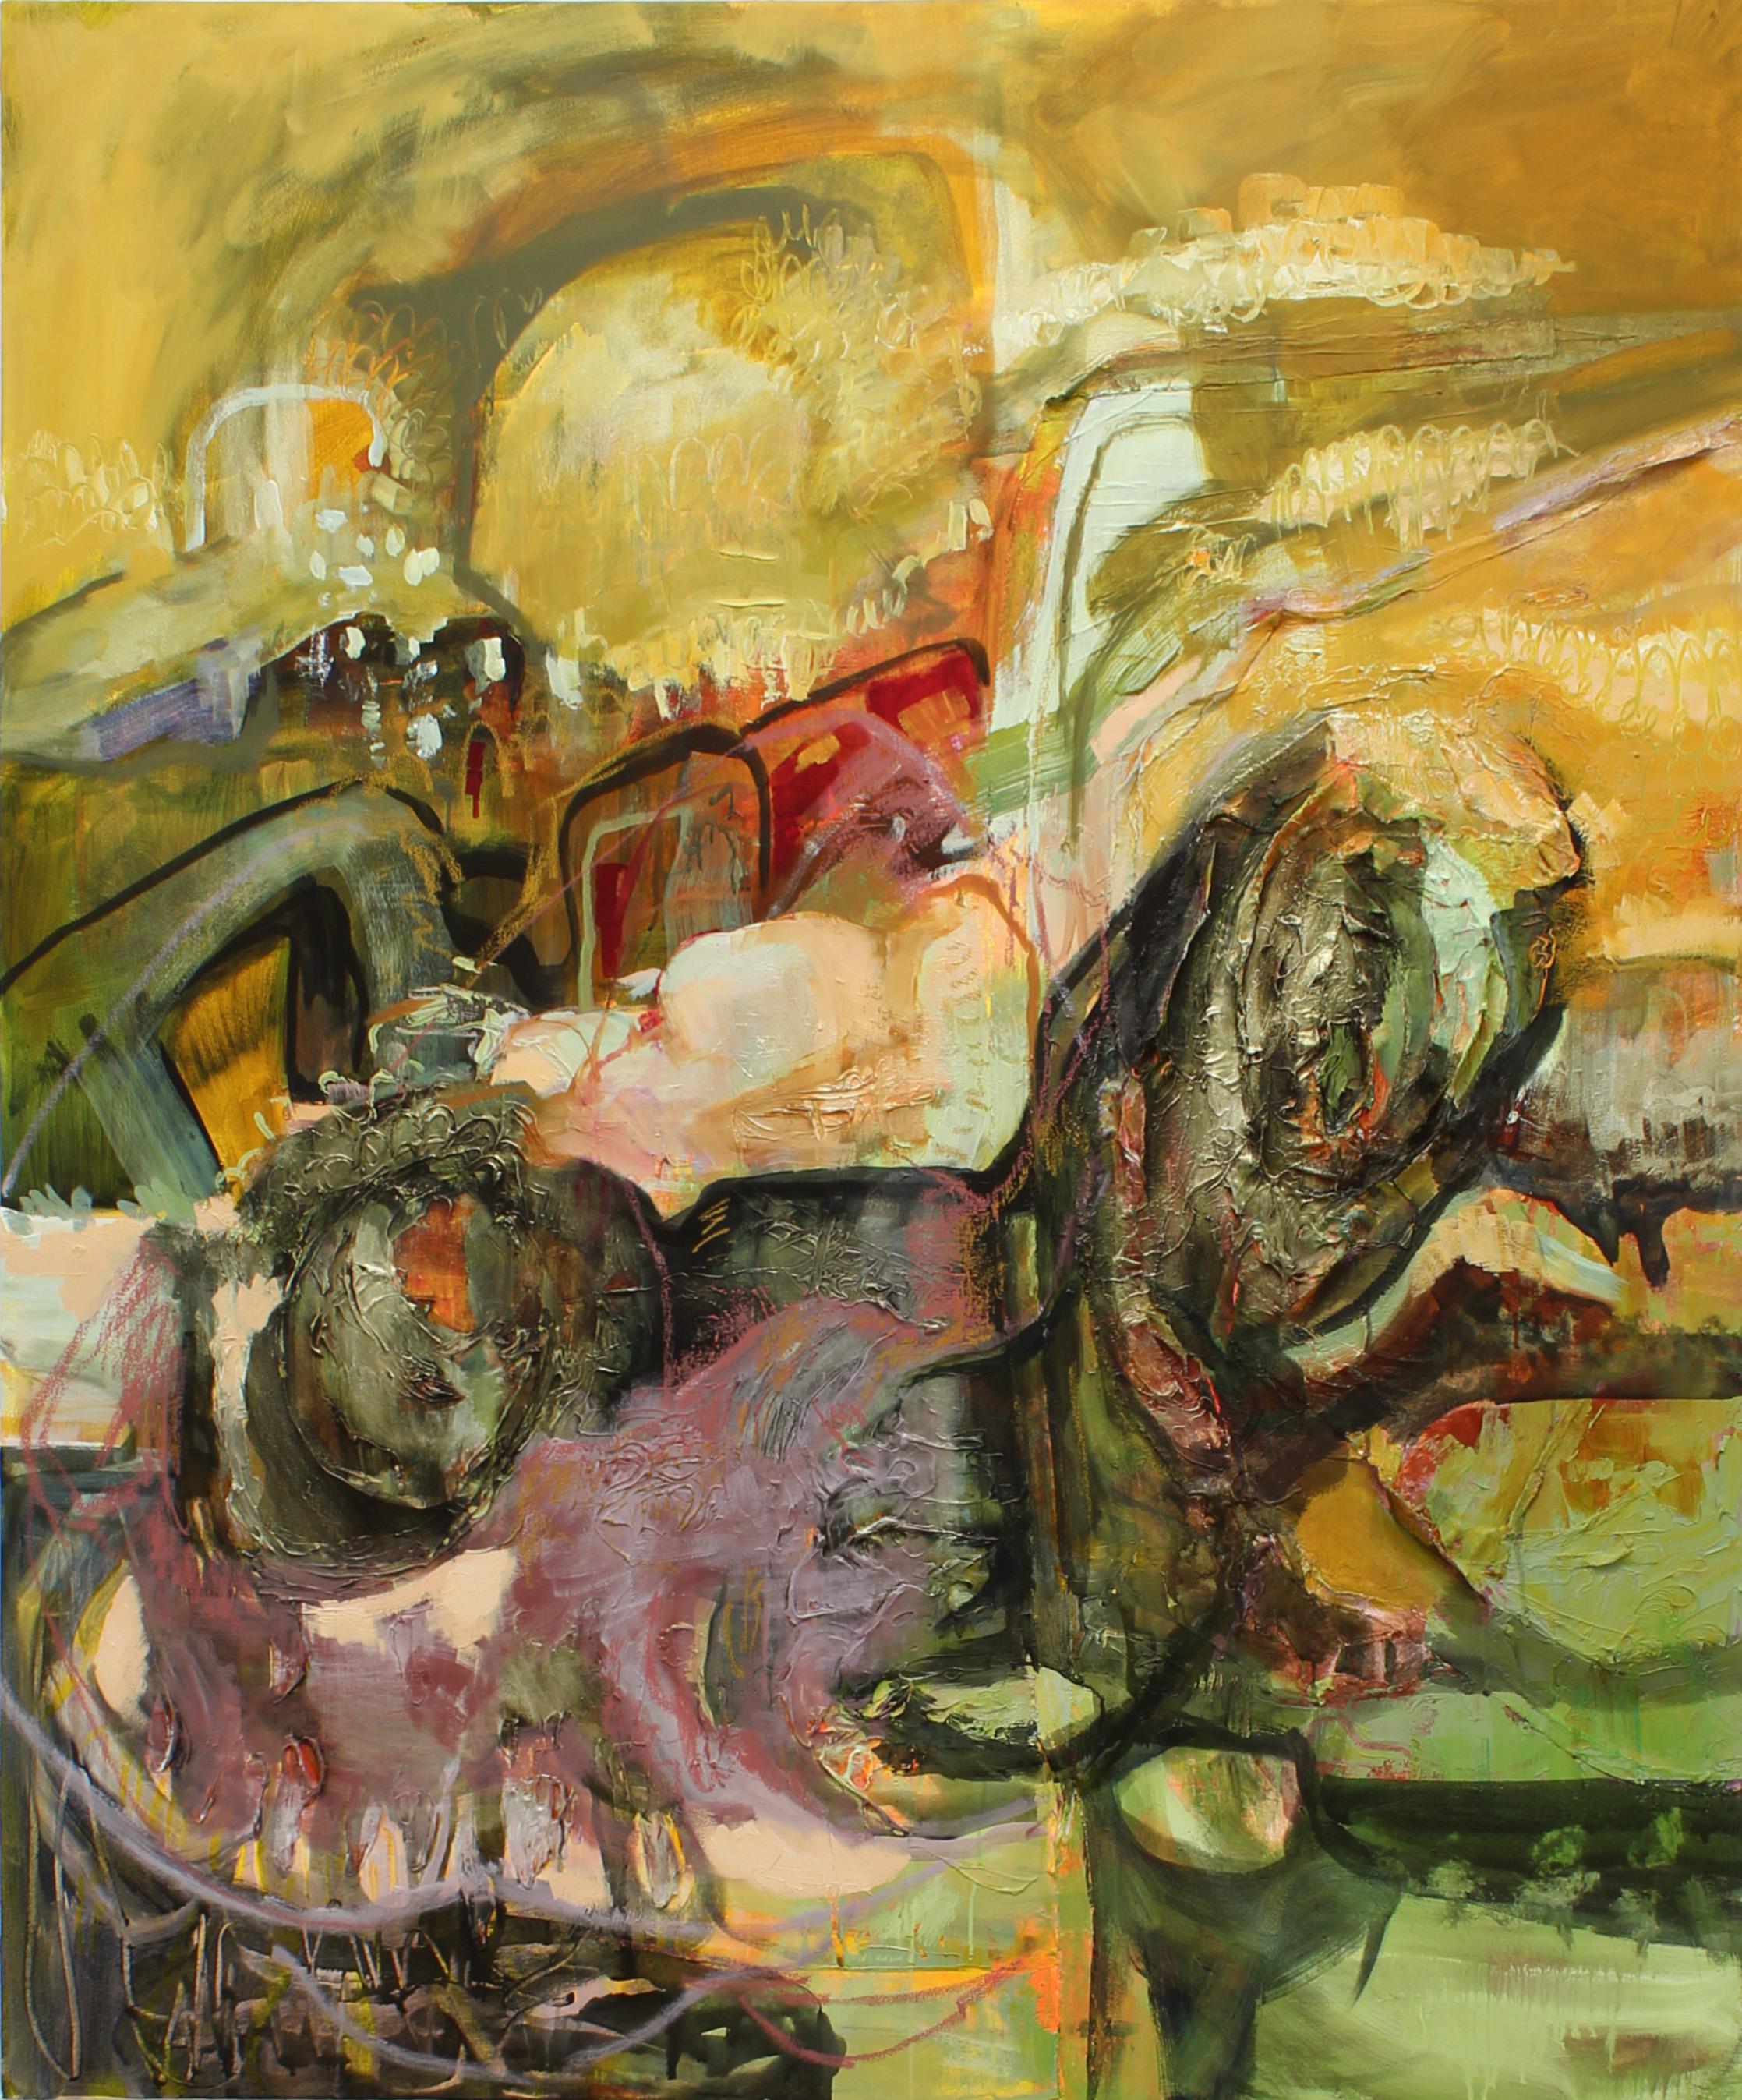 """It Felt So Heavy"" Oil on Canvas. 60x72, 2017."